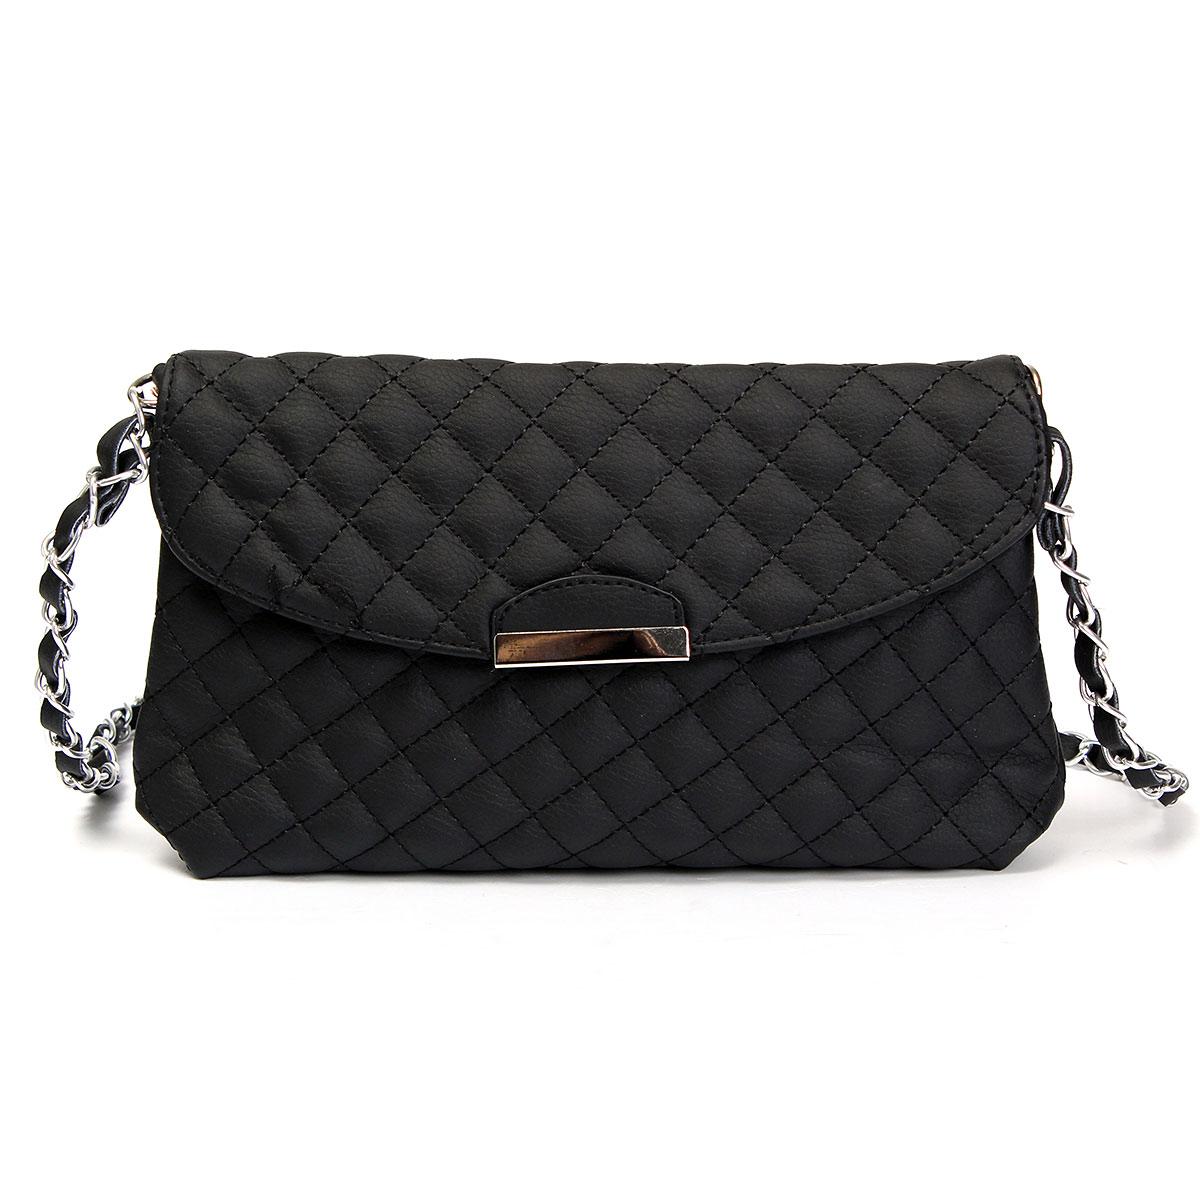 Women Lady Leather Shoulder Bag Handbag Messenger Purse Chain Clutch Tote Hot